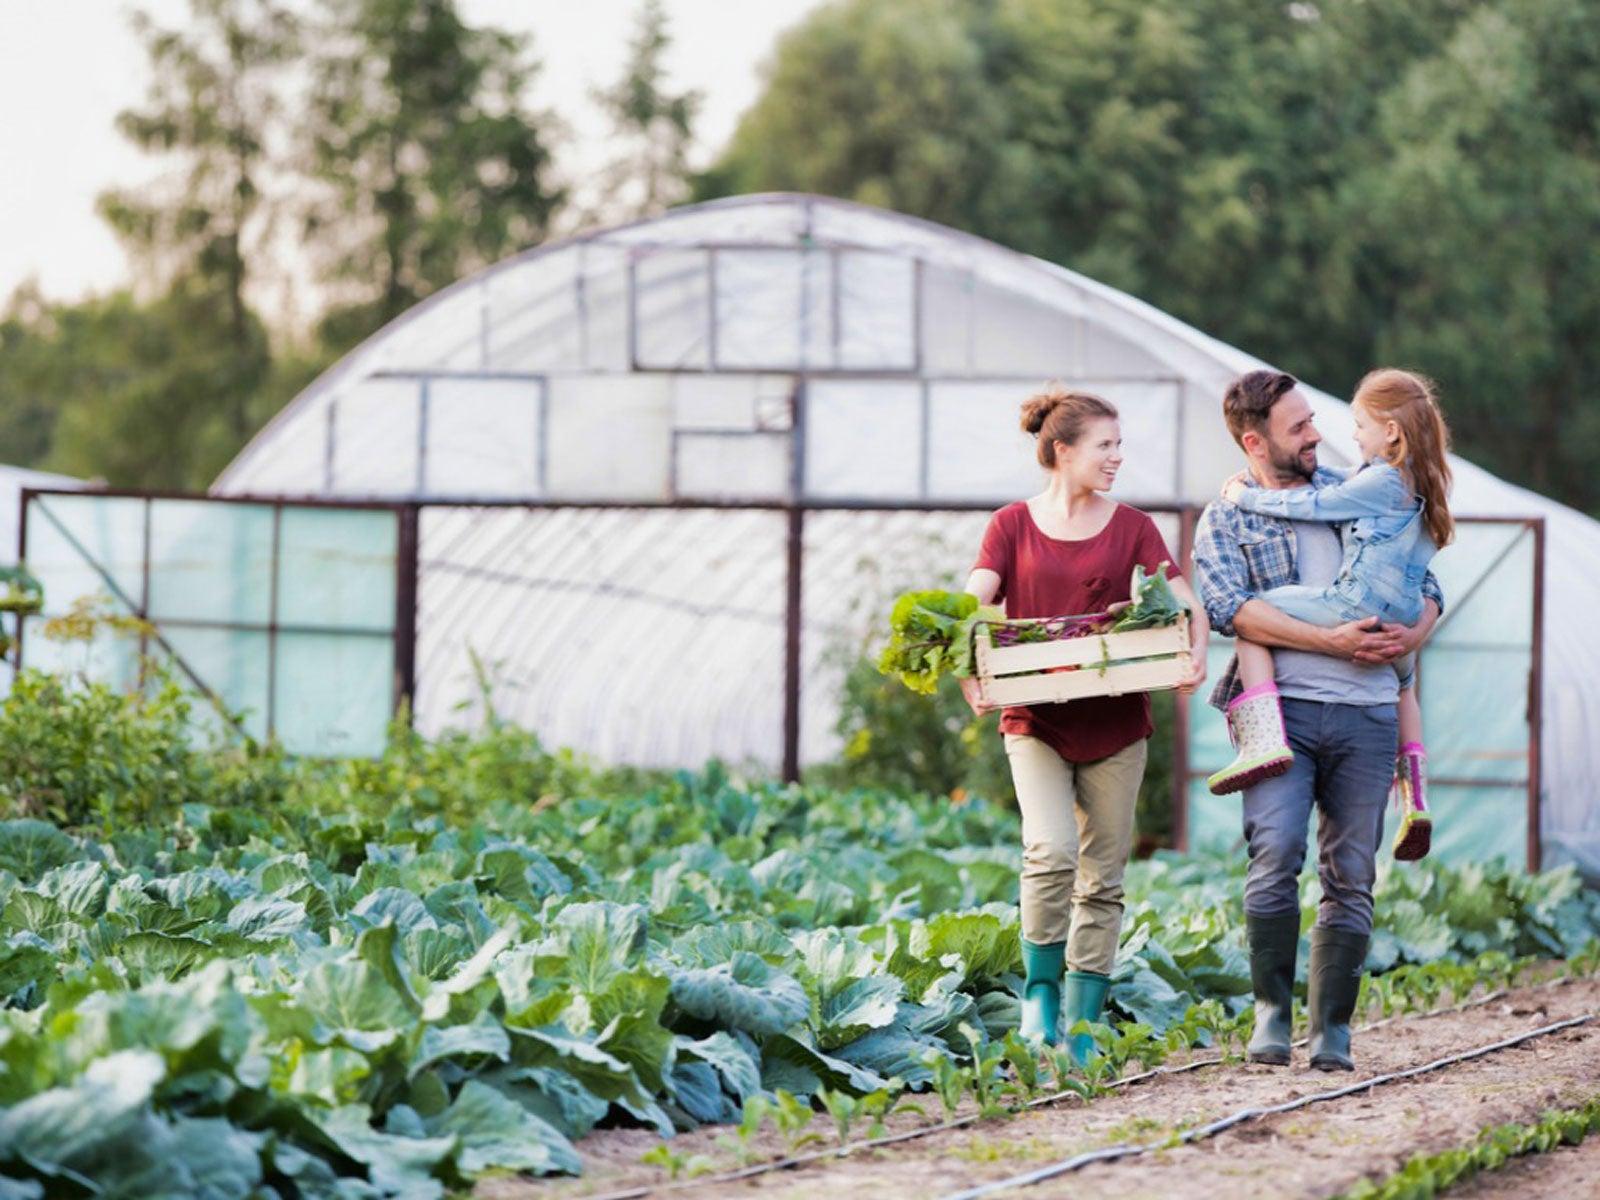 Small Backyard Farm Learn The Basics Of Starting A Small Farm